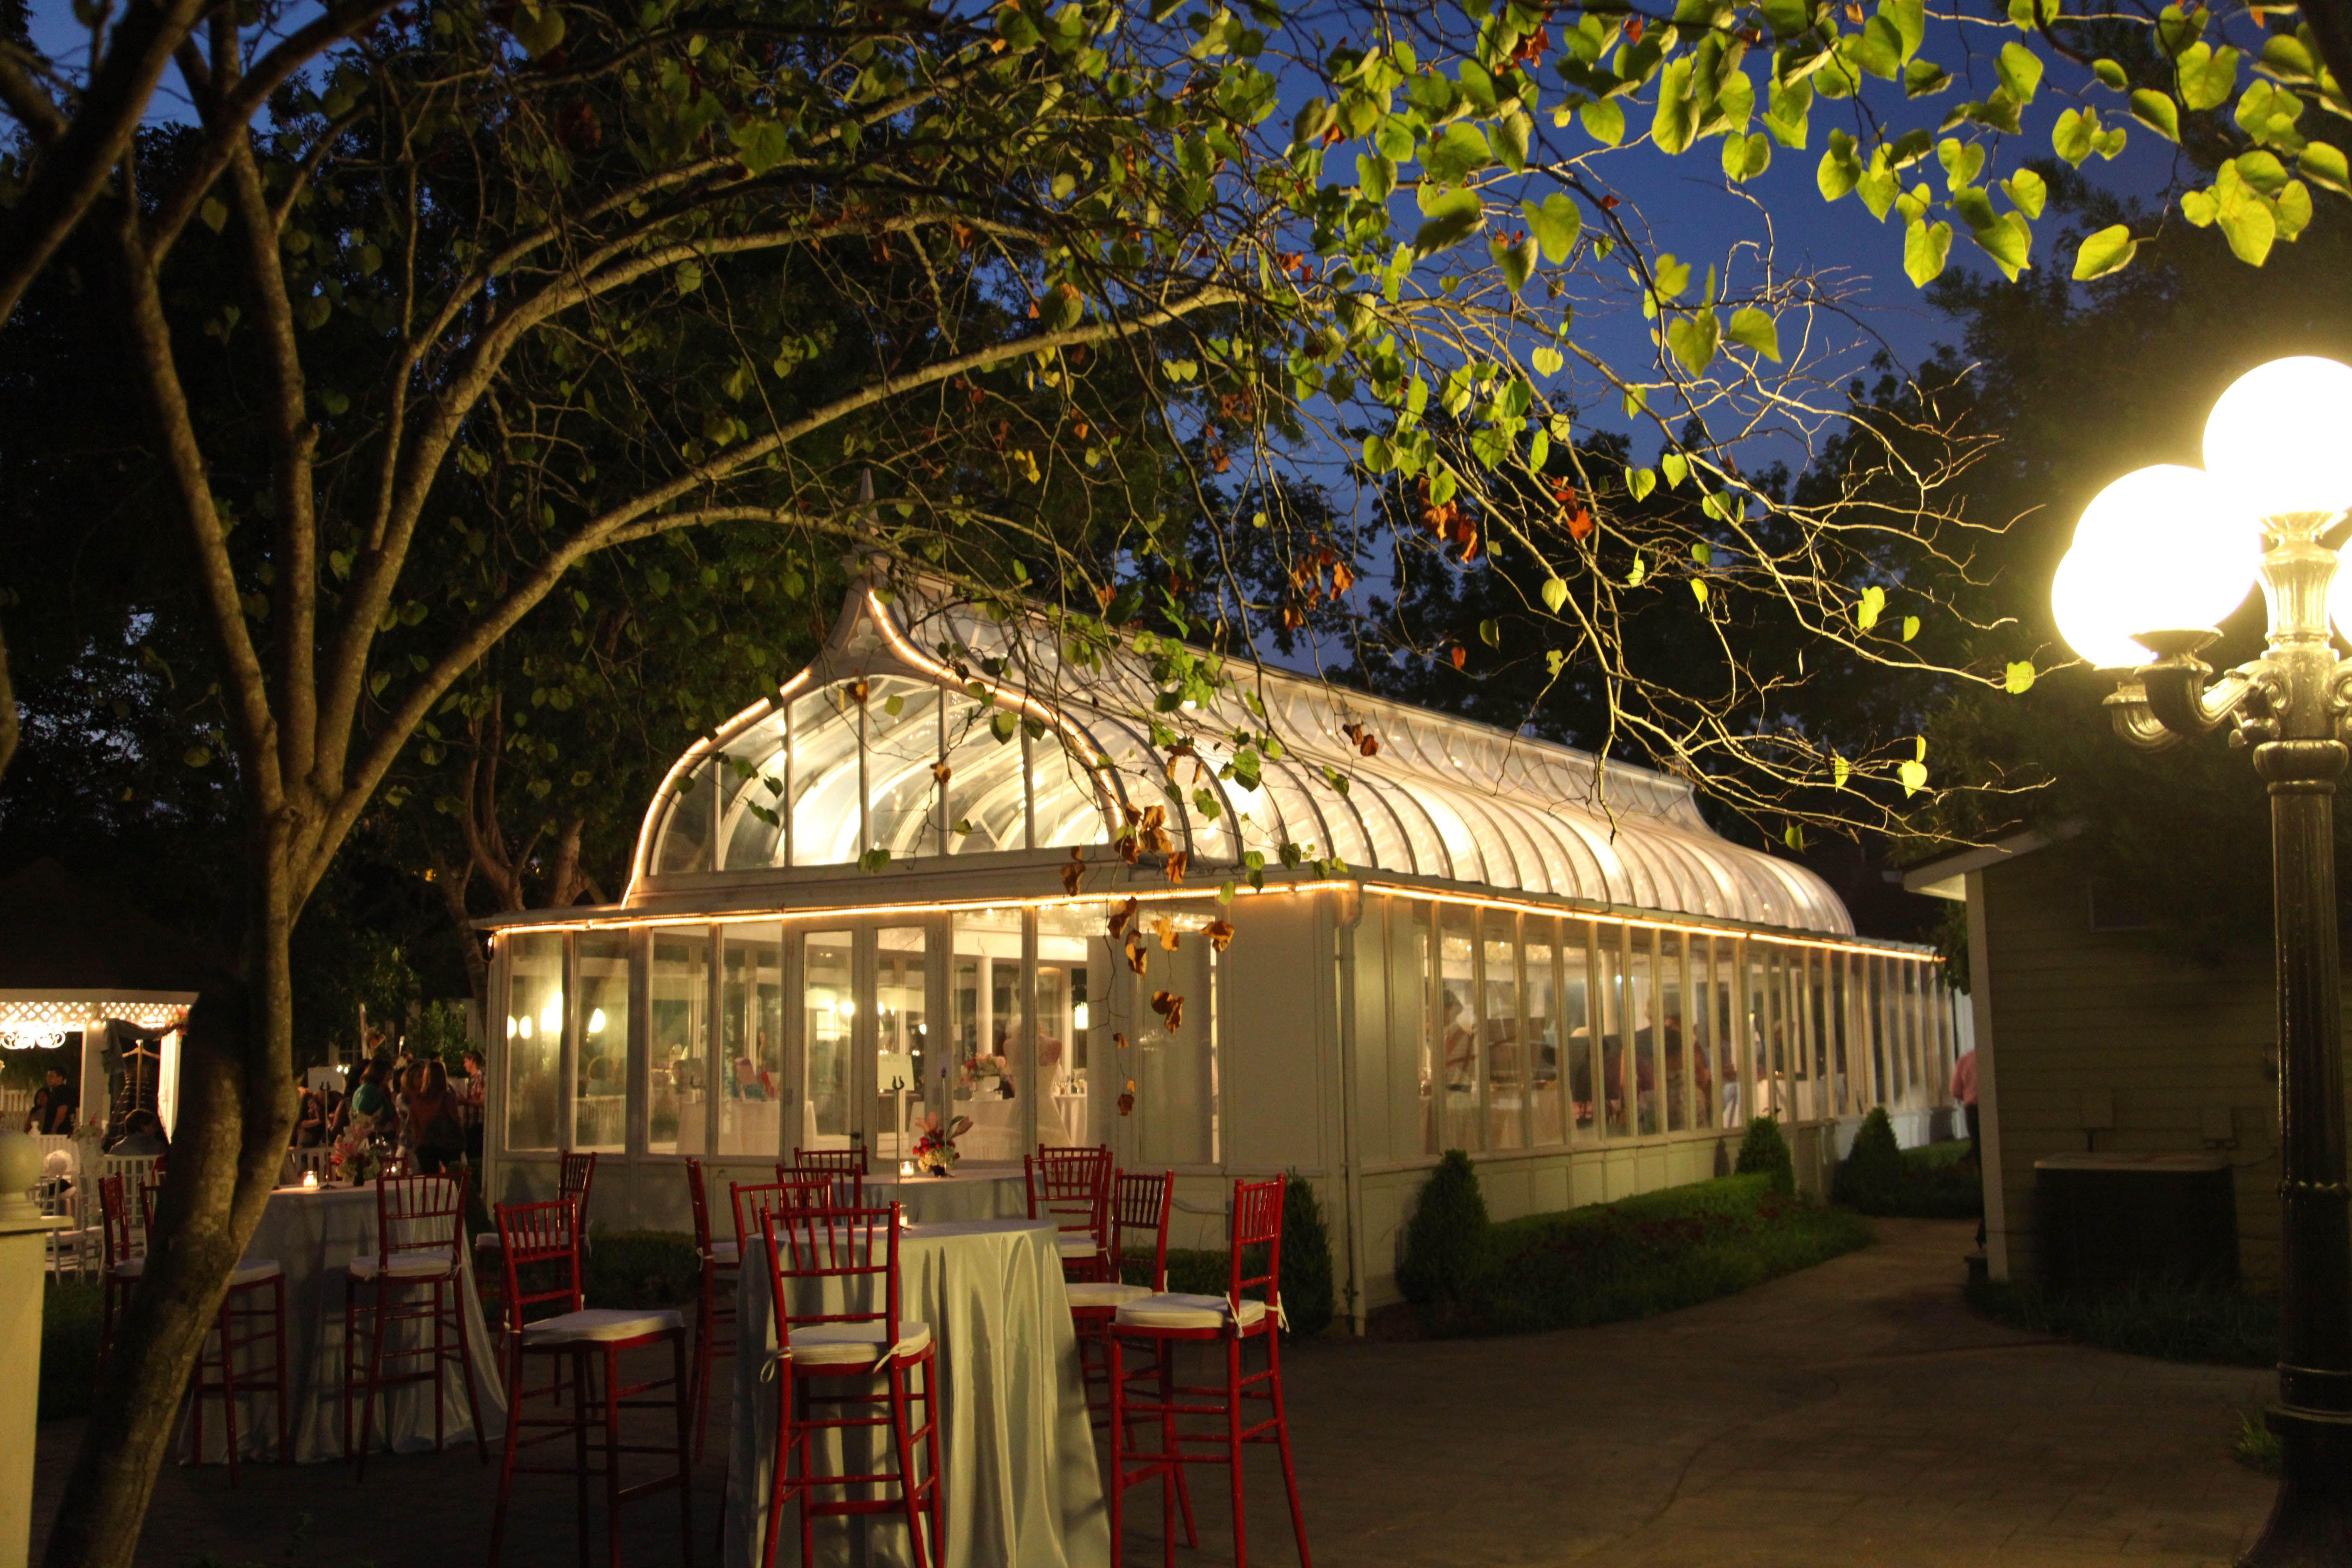 Gardens of Bammel Lane @ night | Love is Waiting... | Pinterest ...